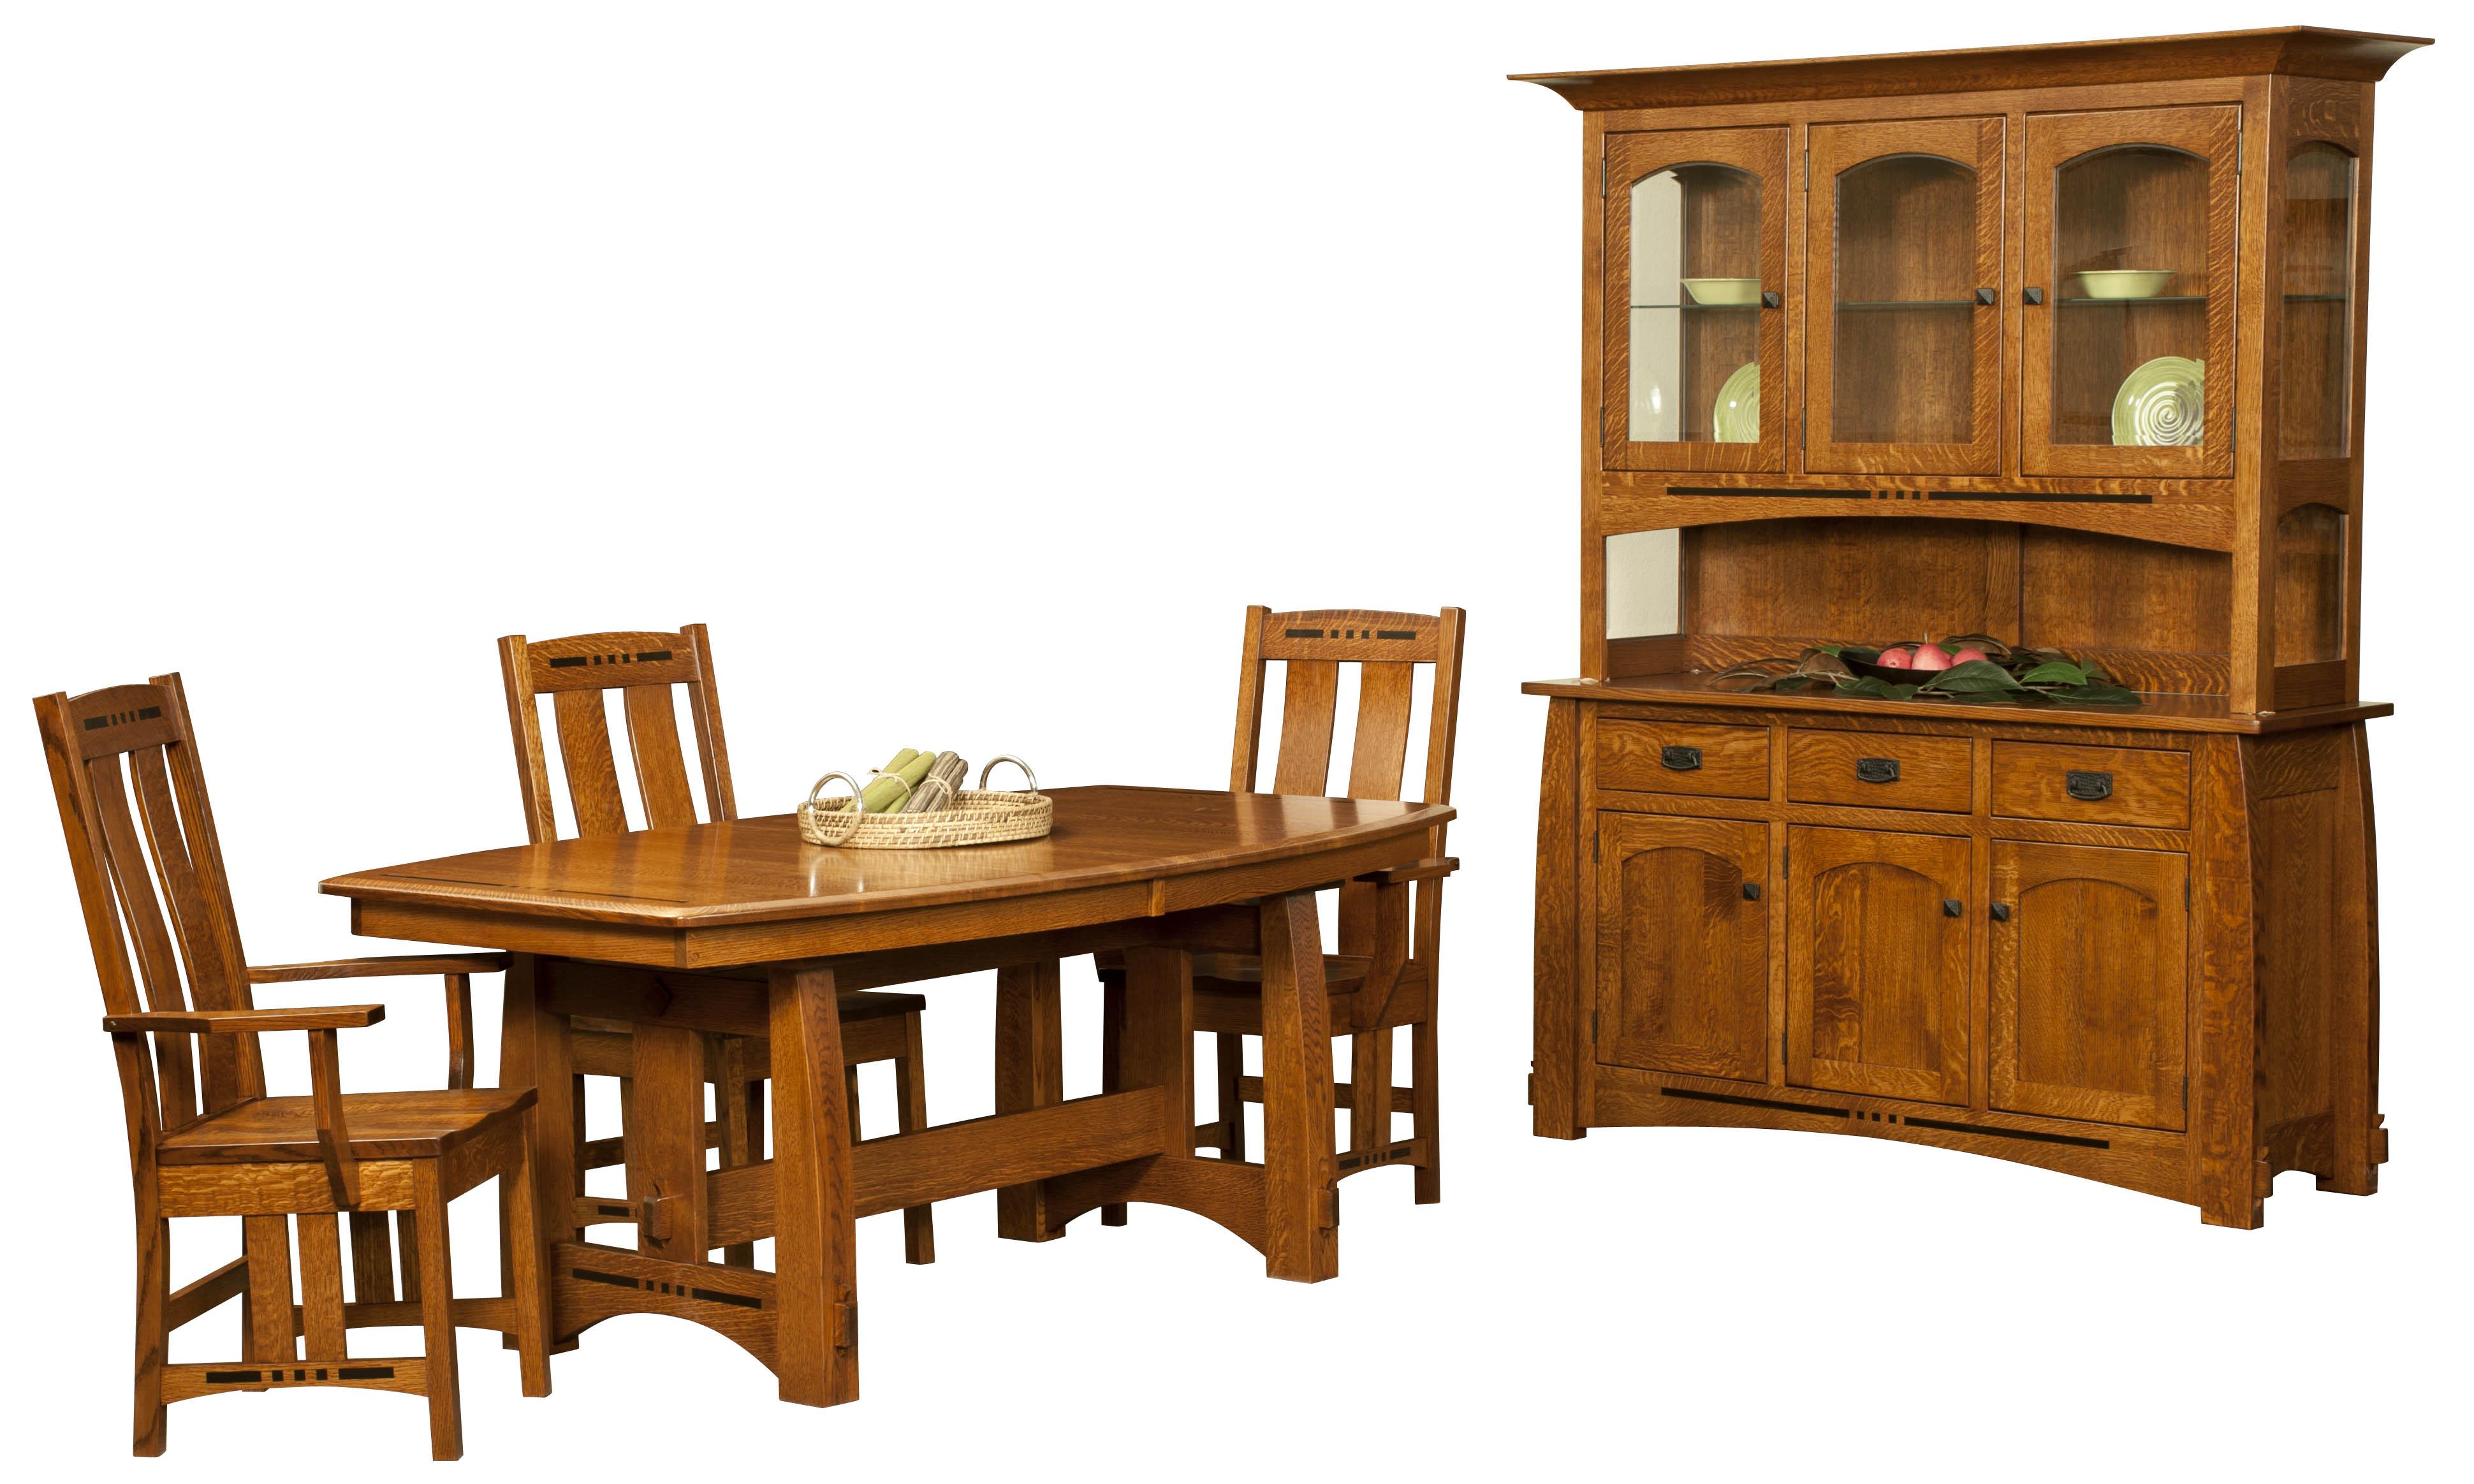 Furniture PNG - 26720